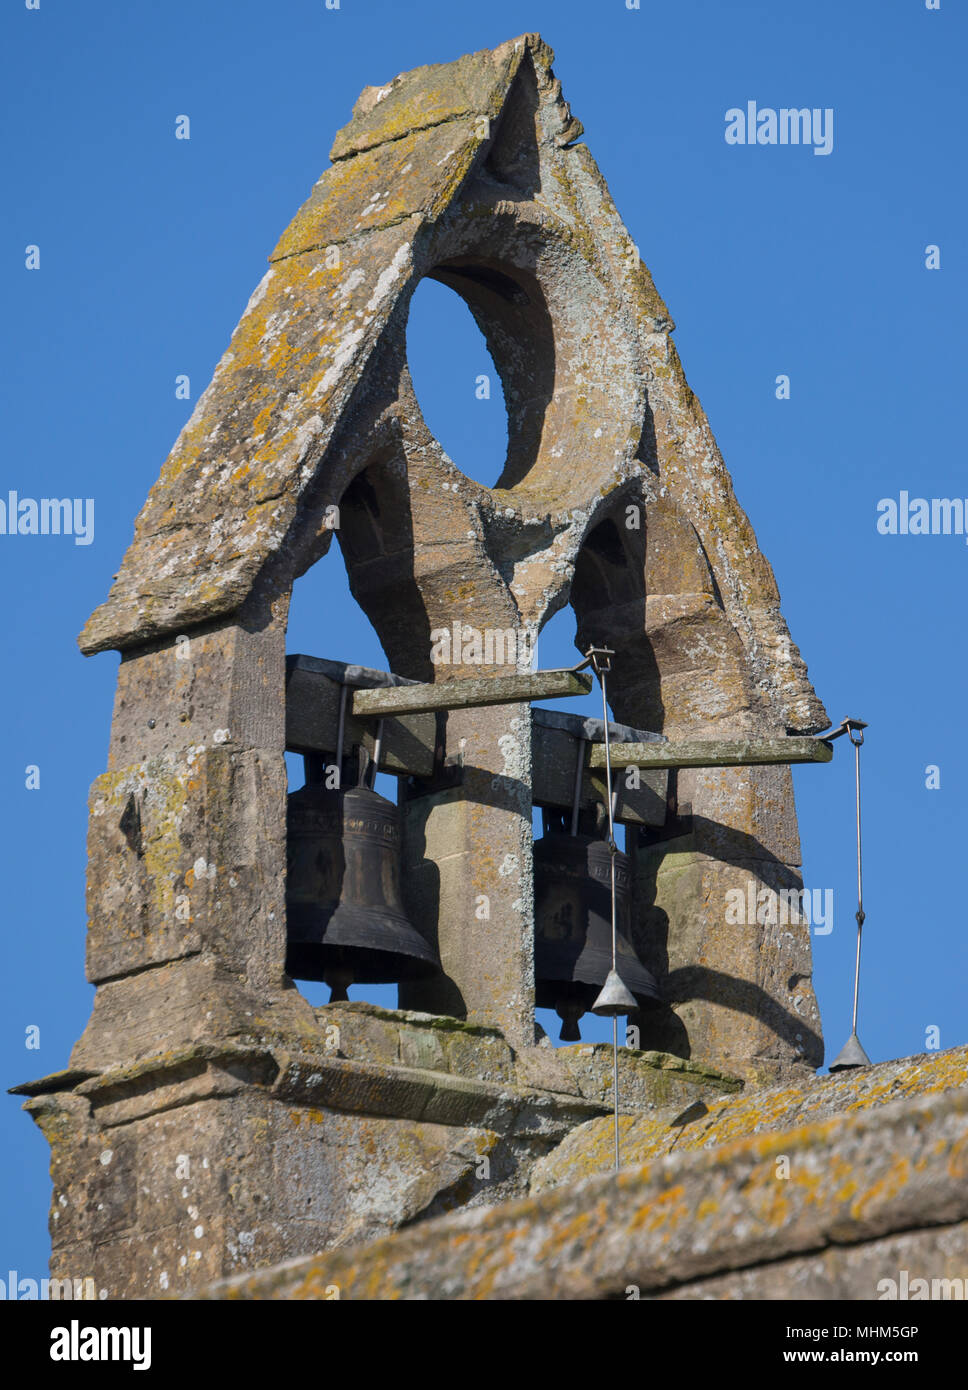 Ancient church bells - Stock Image